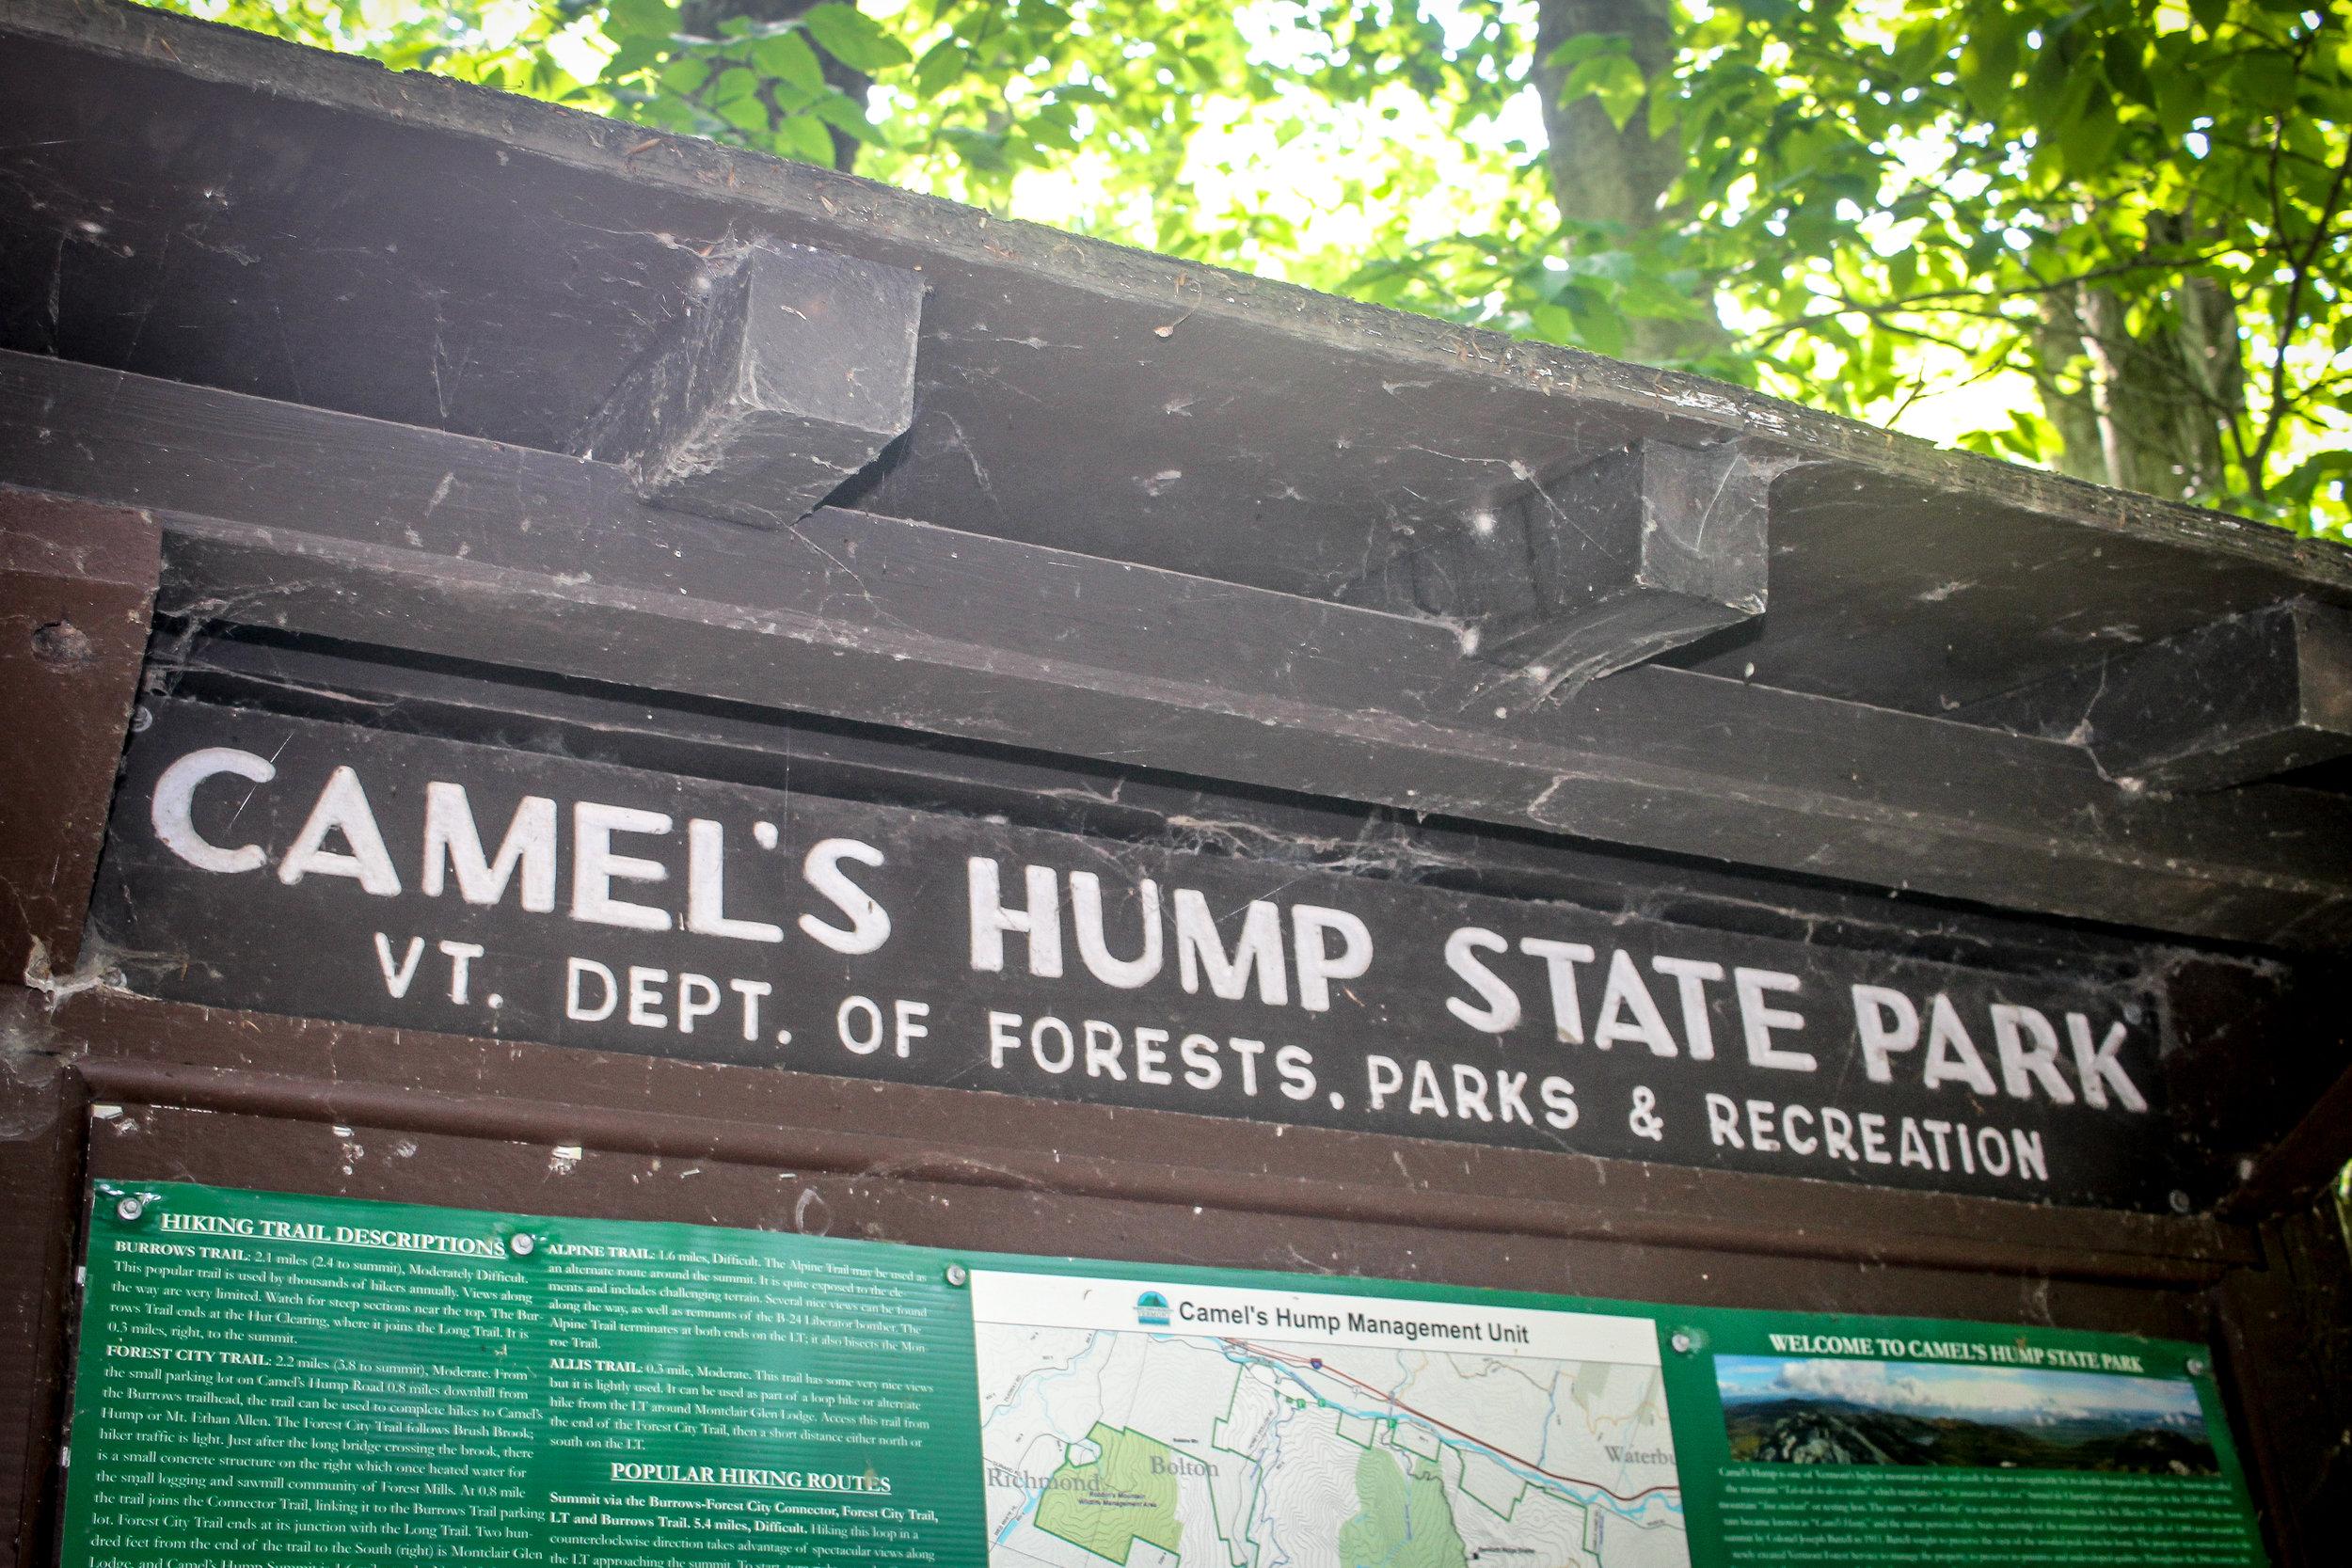 Camel's Hump TWG_.jpg